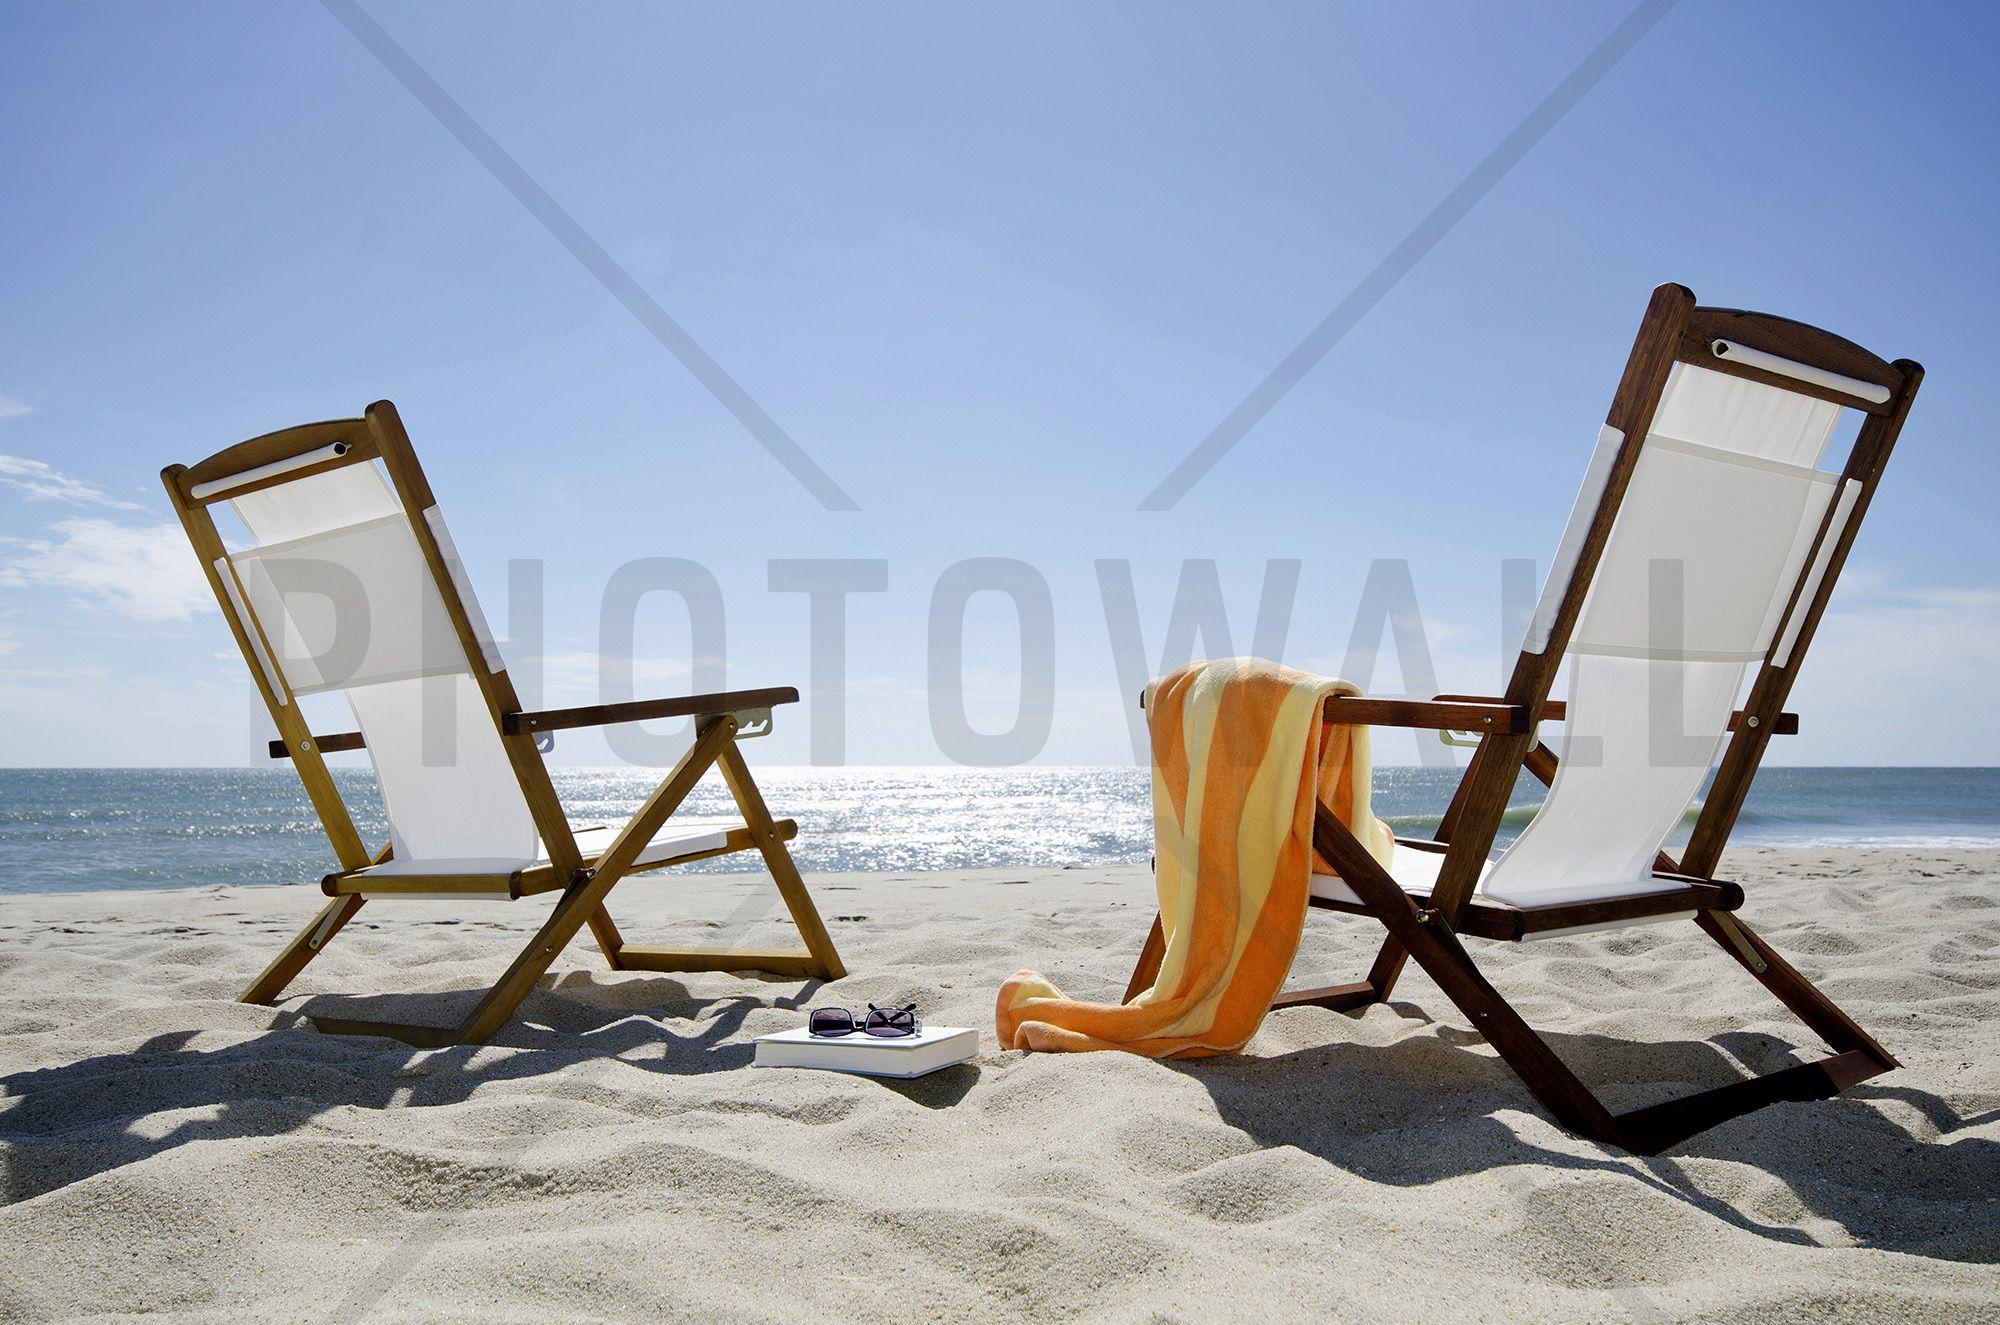 Sun Chairs - Wall Mural & Photo Wallpaper - Photowall